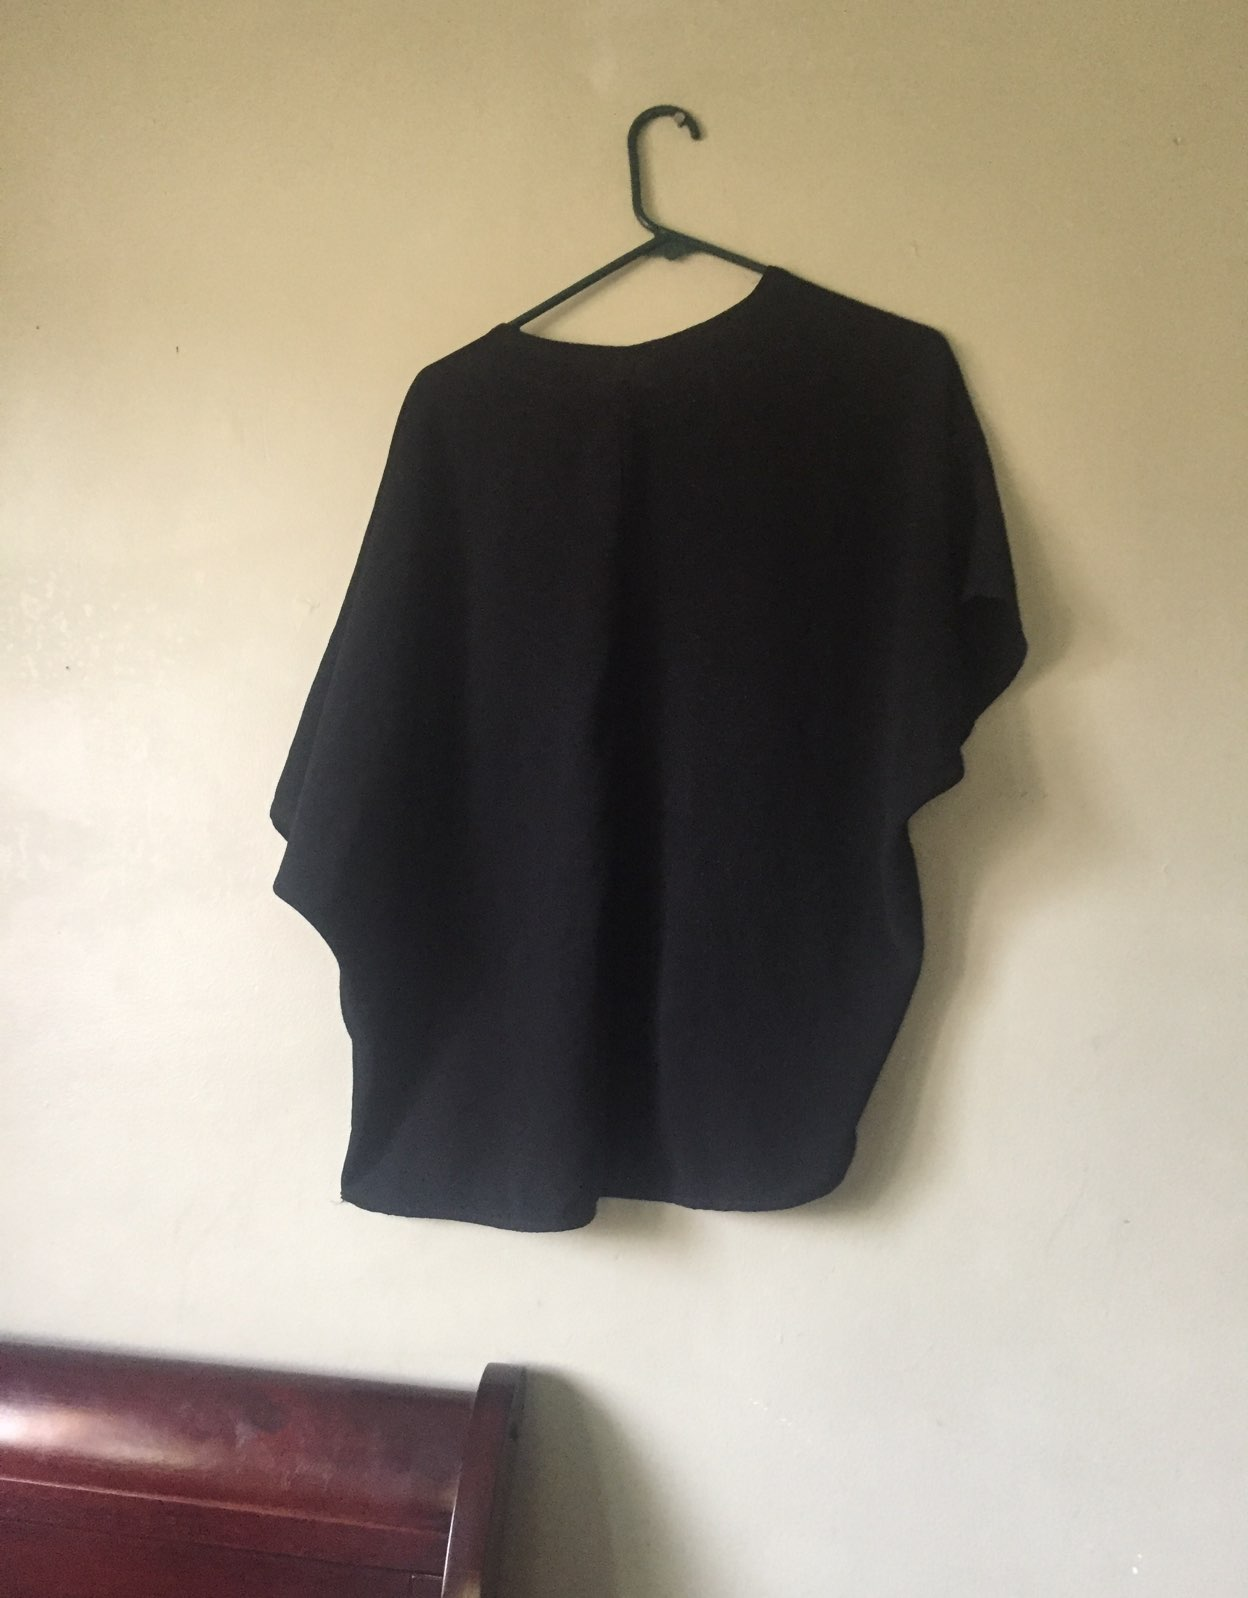 Plain Black Kimono Cardigan - Mercari: BUY & SELL THINGS YOU LOVE